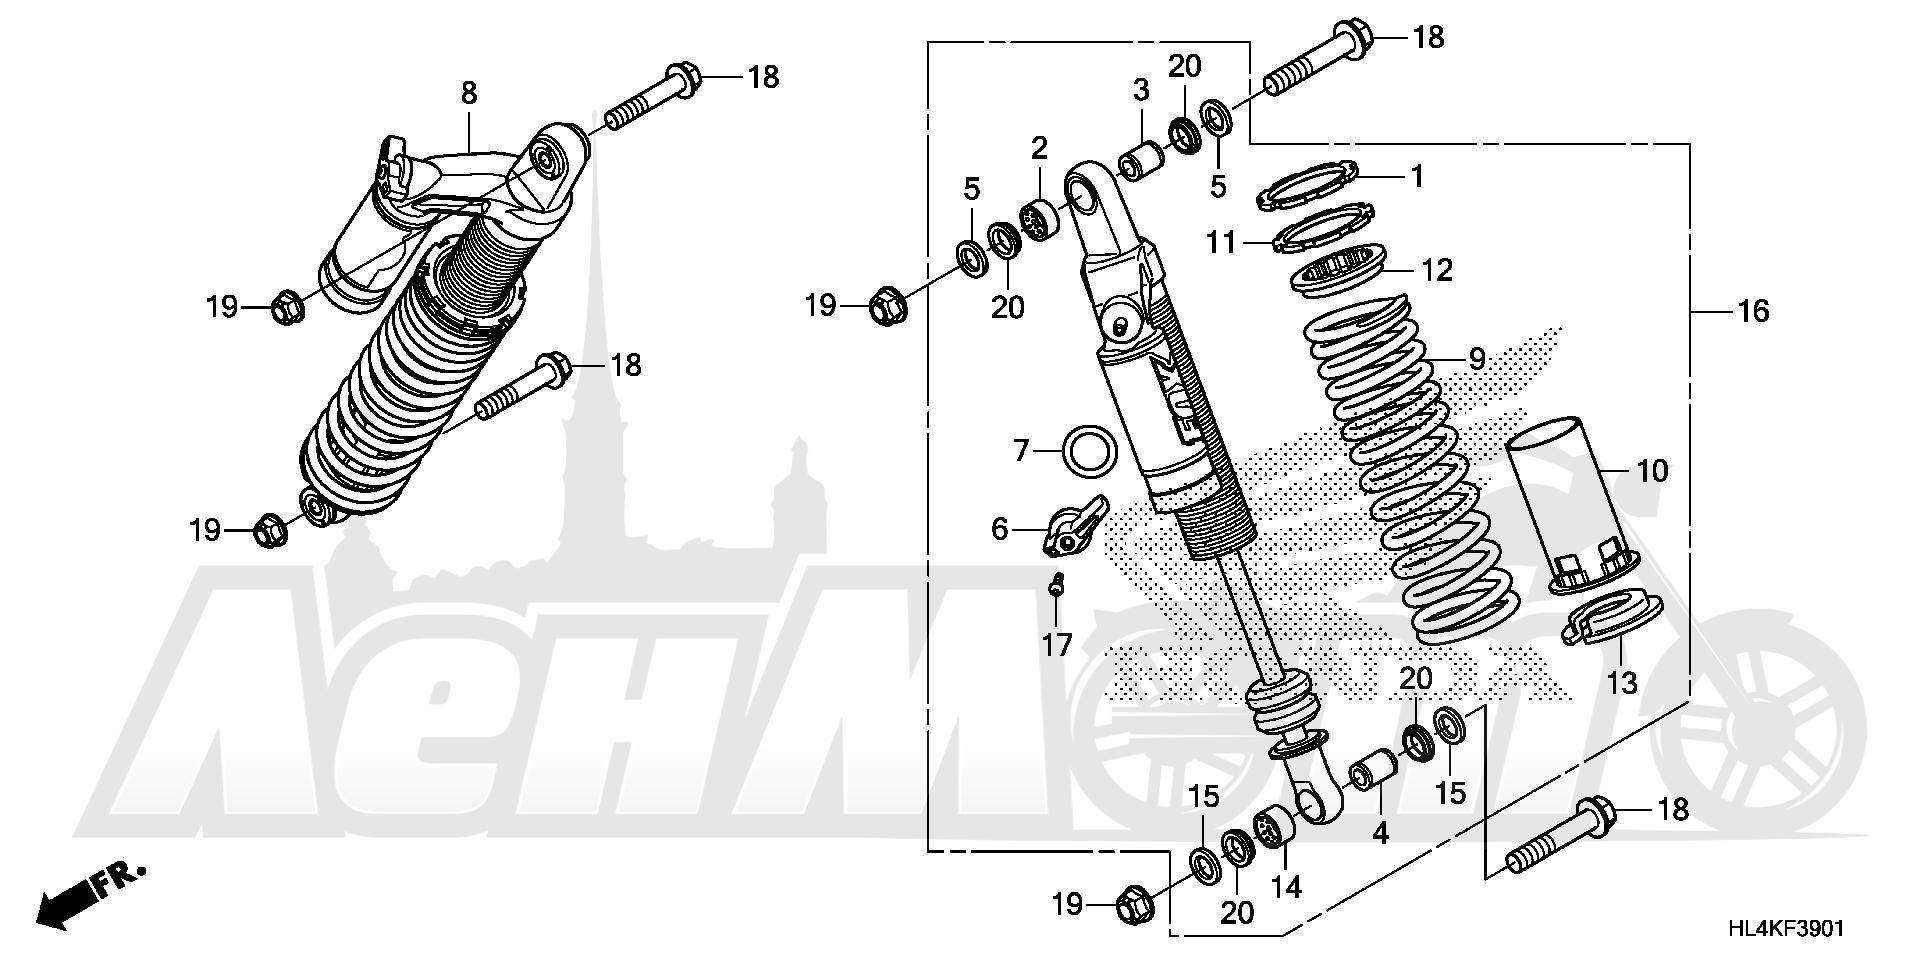 Запчасти для Квадроцикла Honda 2019 SXS1000M5D Раздел: REAR SHOCK ABSORBER (2) | зад амортизатор (2)